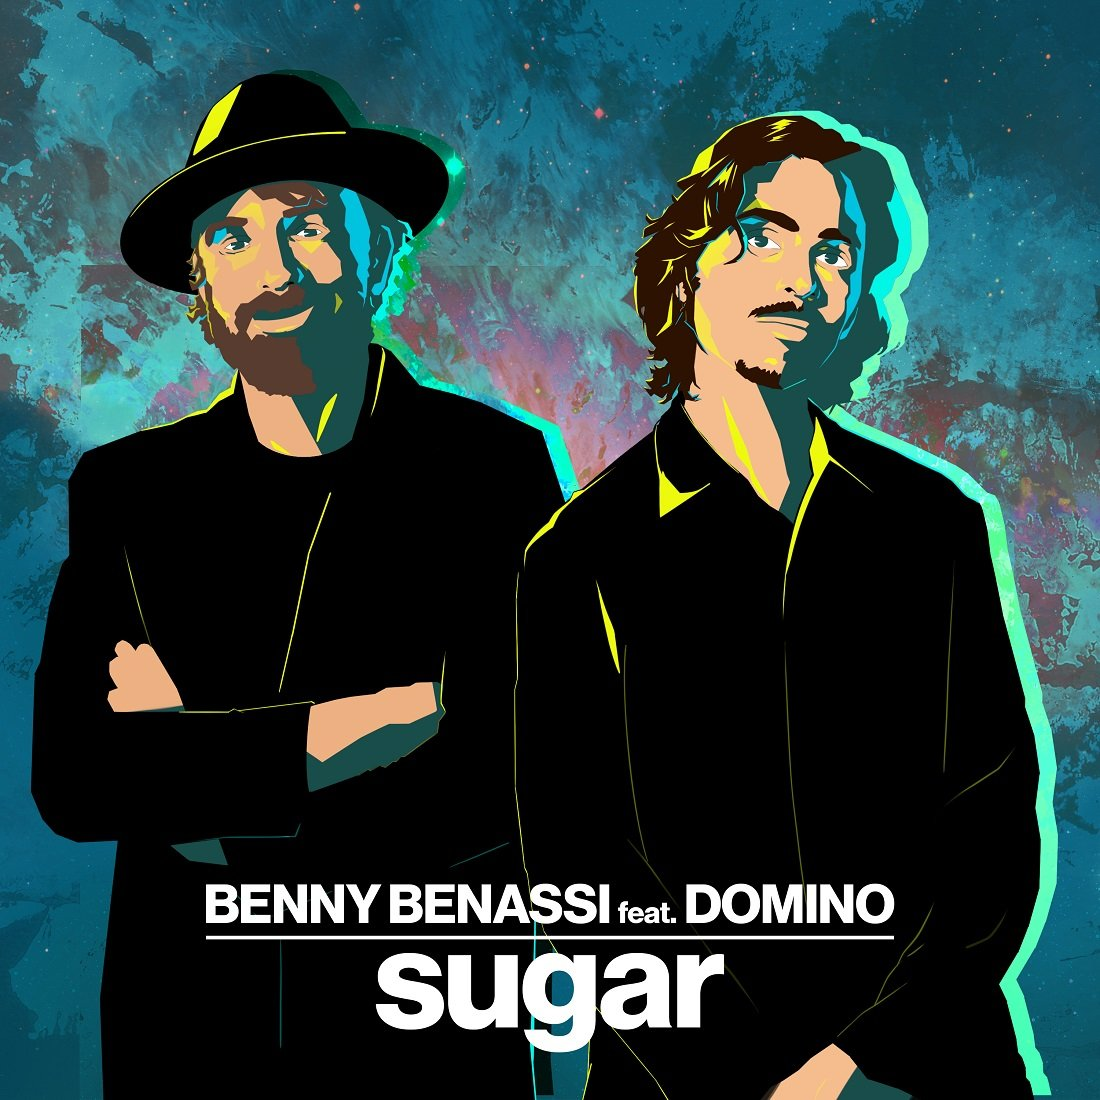 Benny Benassi feat Domino Sugar